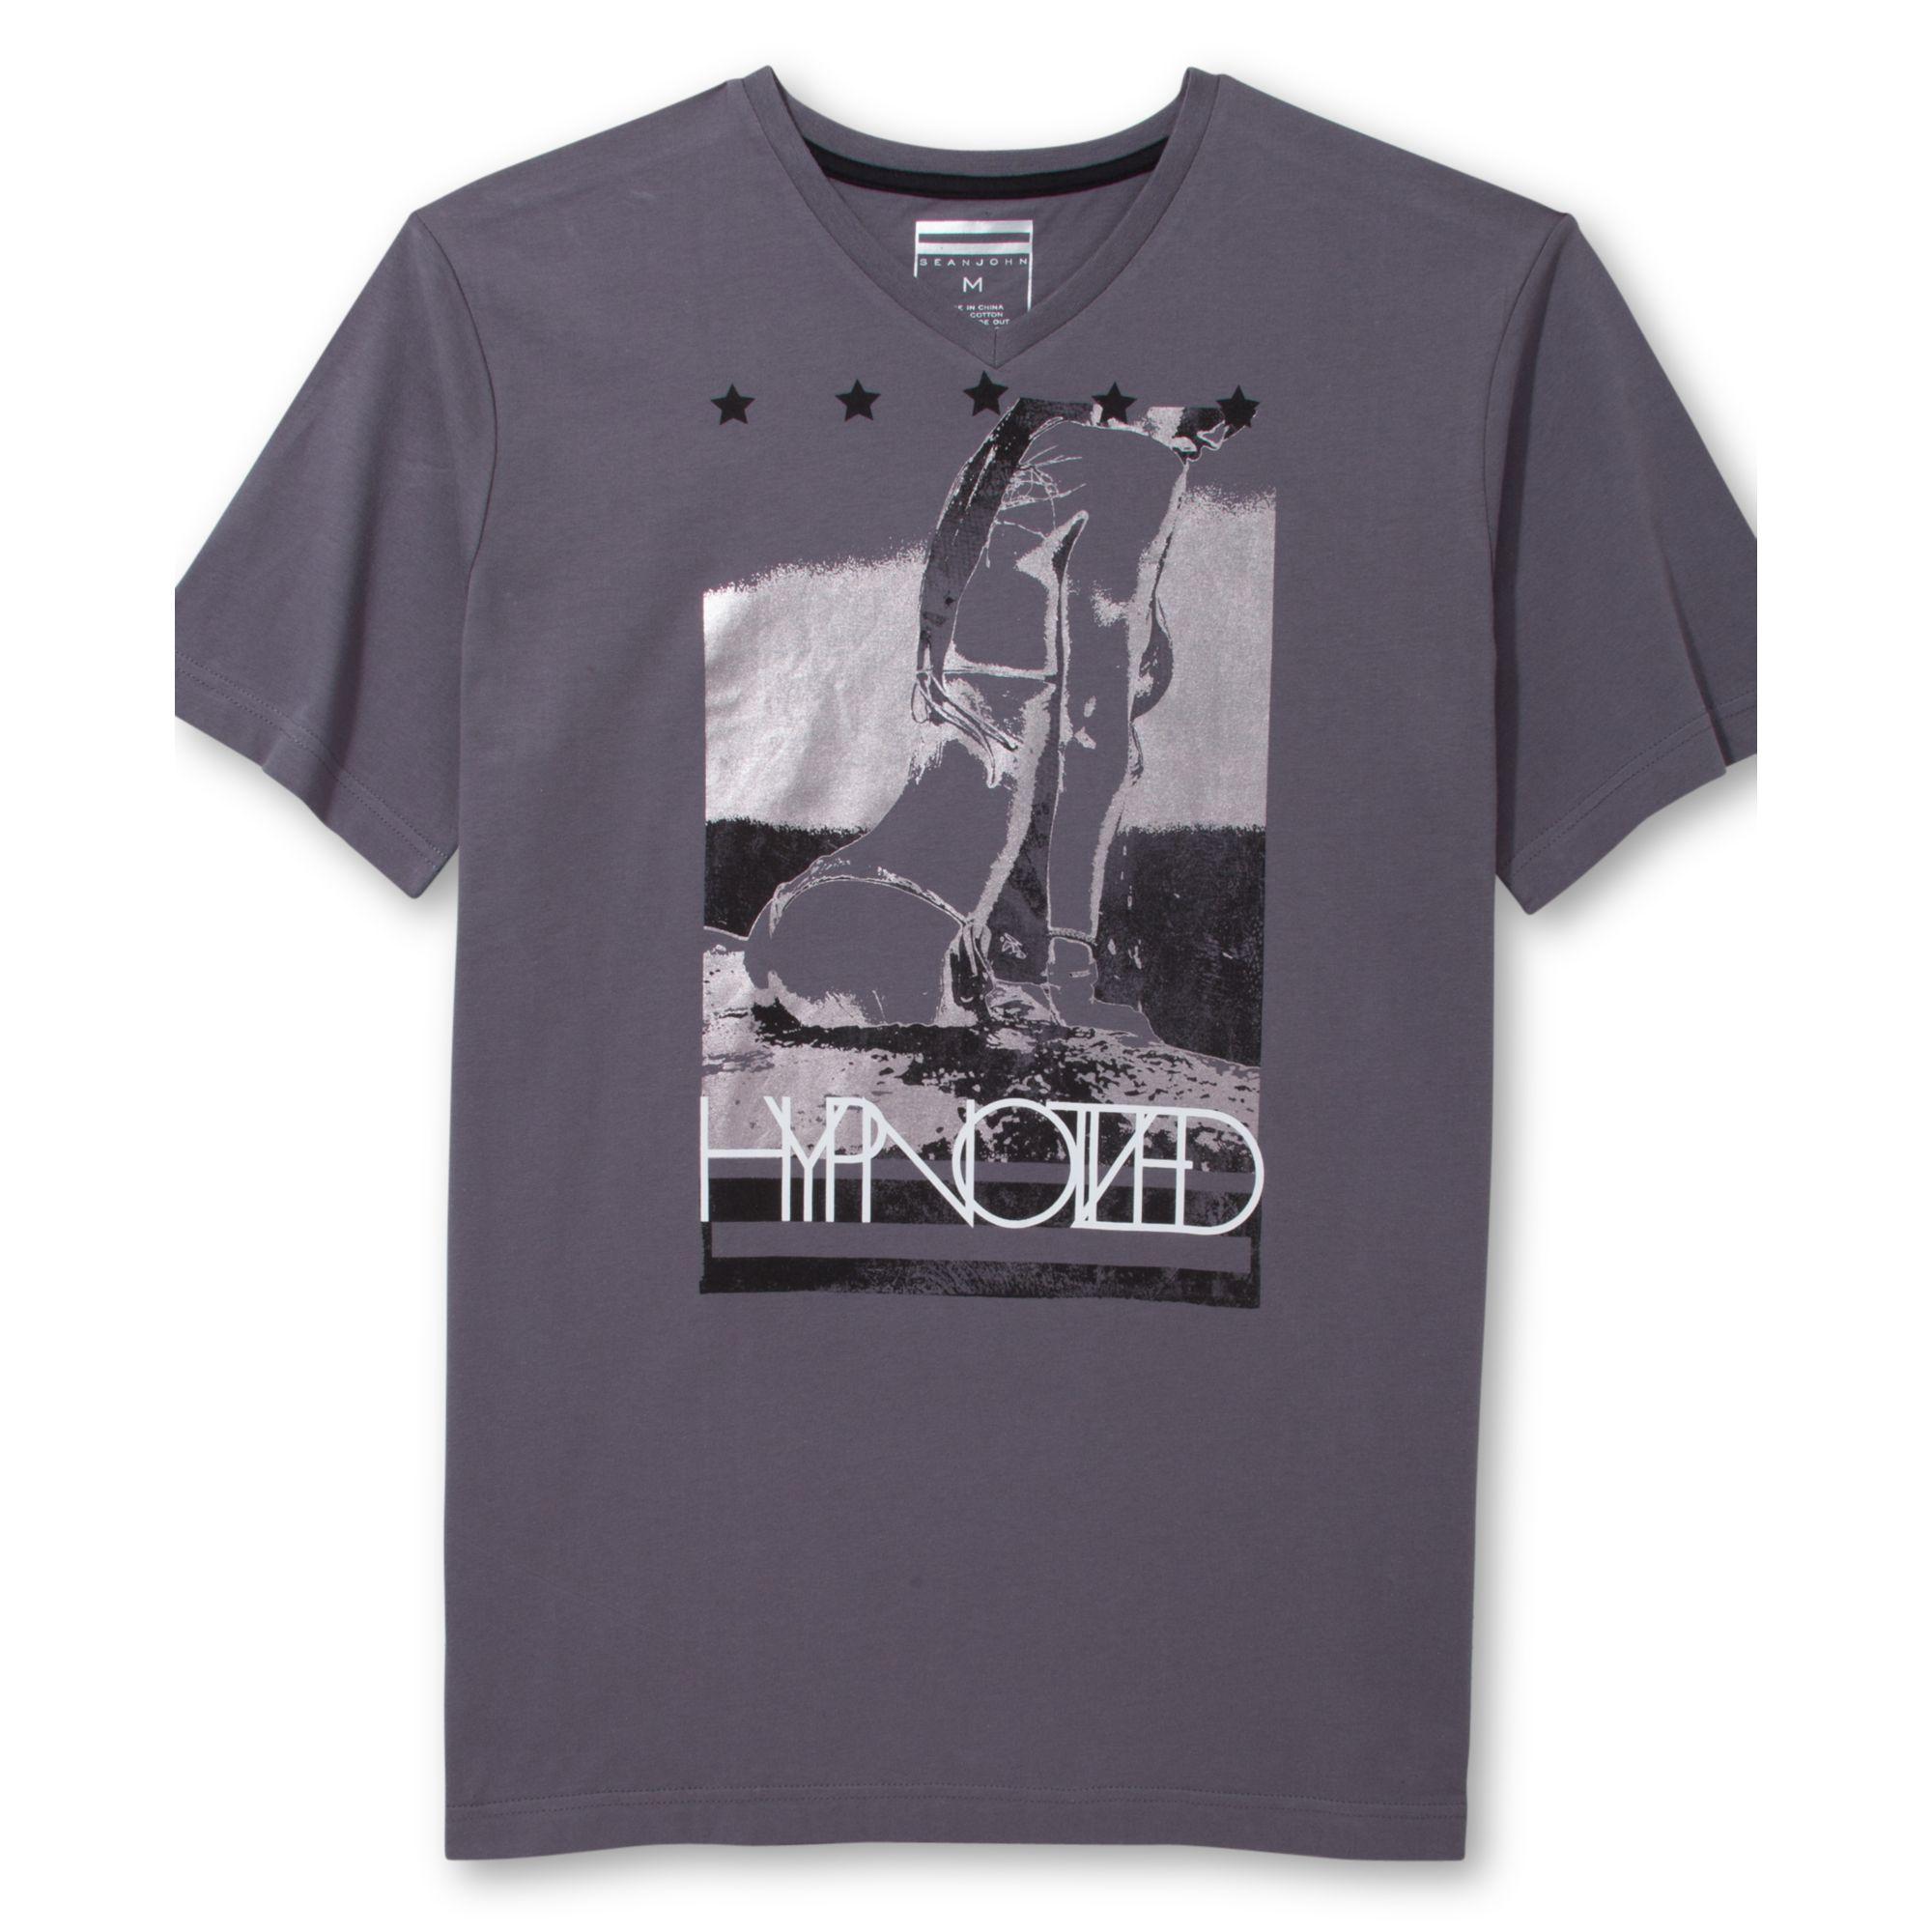 Sean john short sleeve graphic t shirt in gray for men for Sean john t shirts for mens